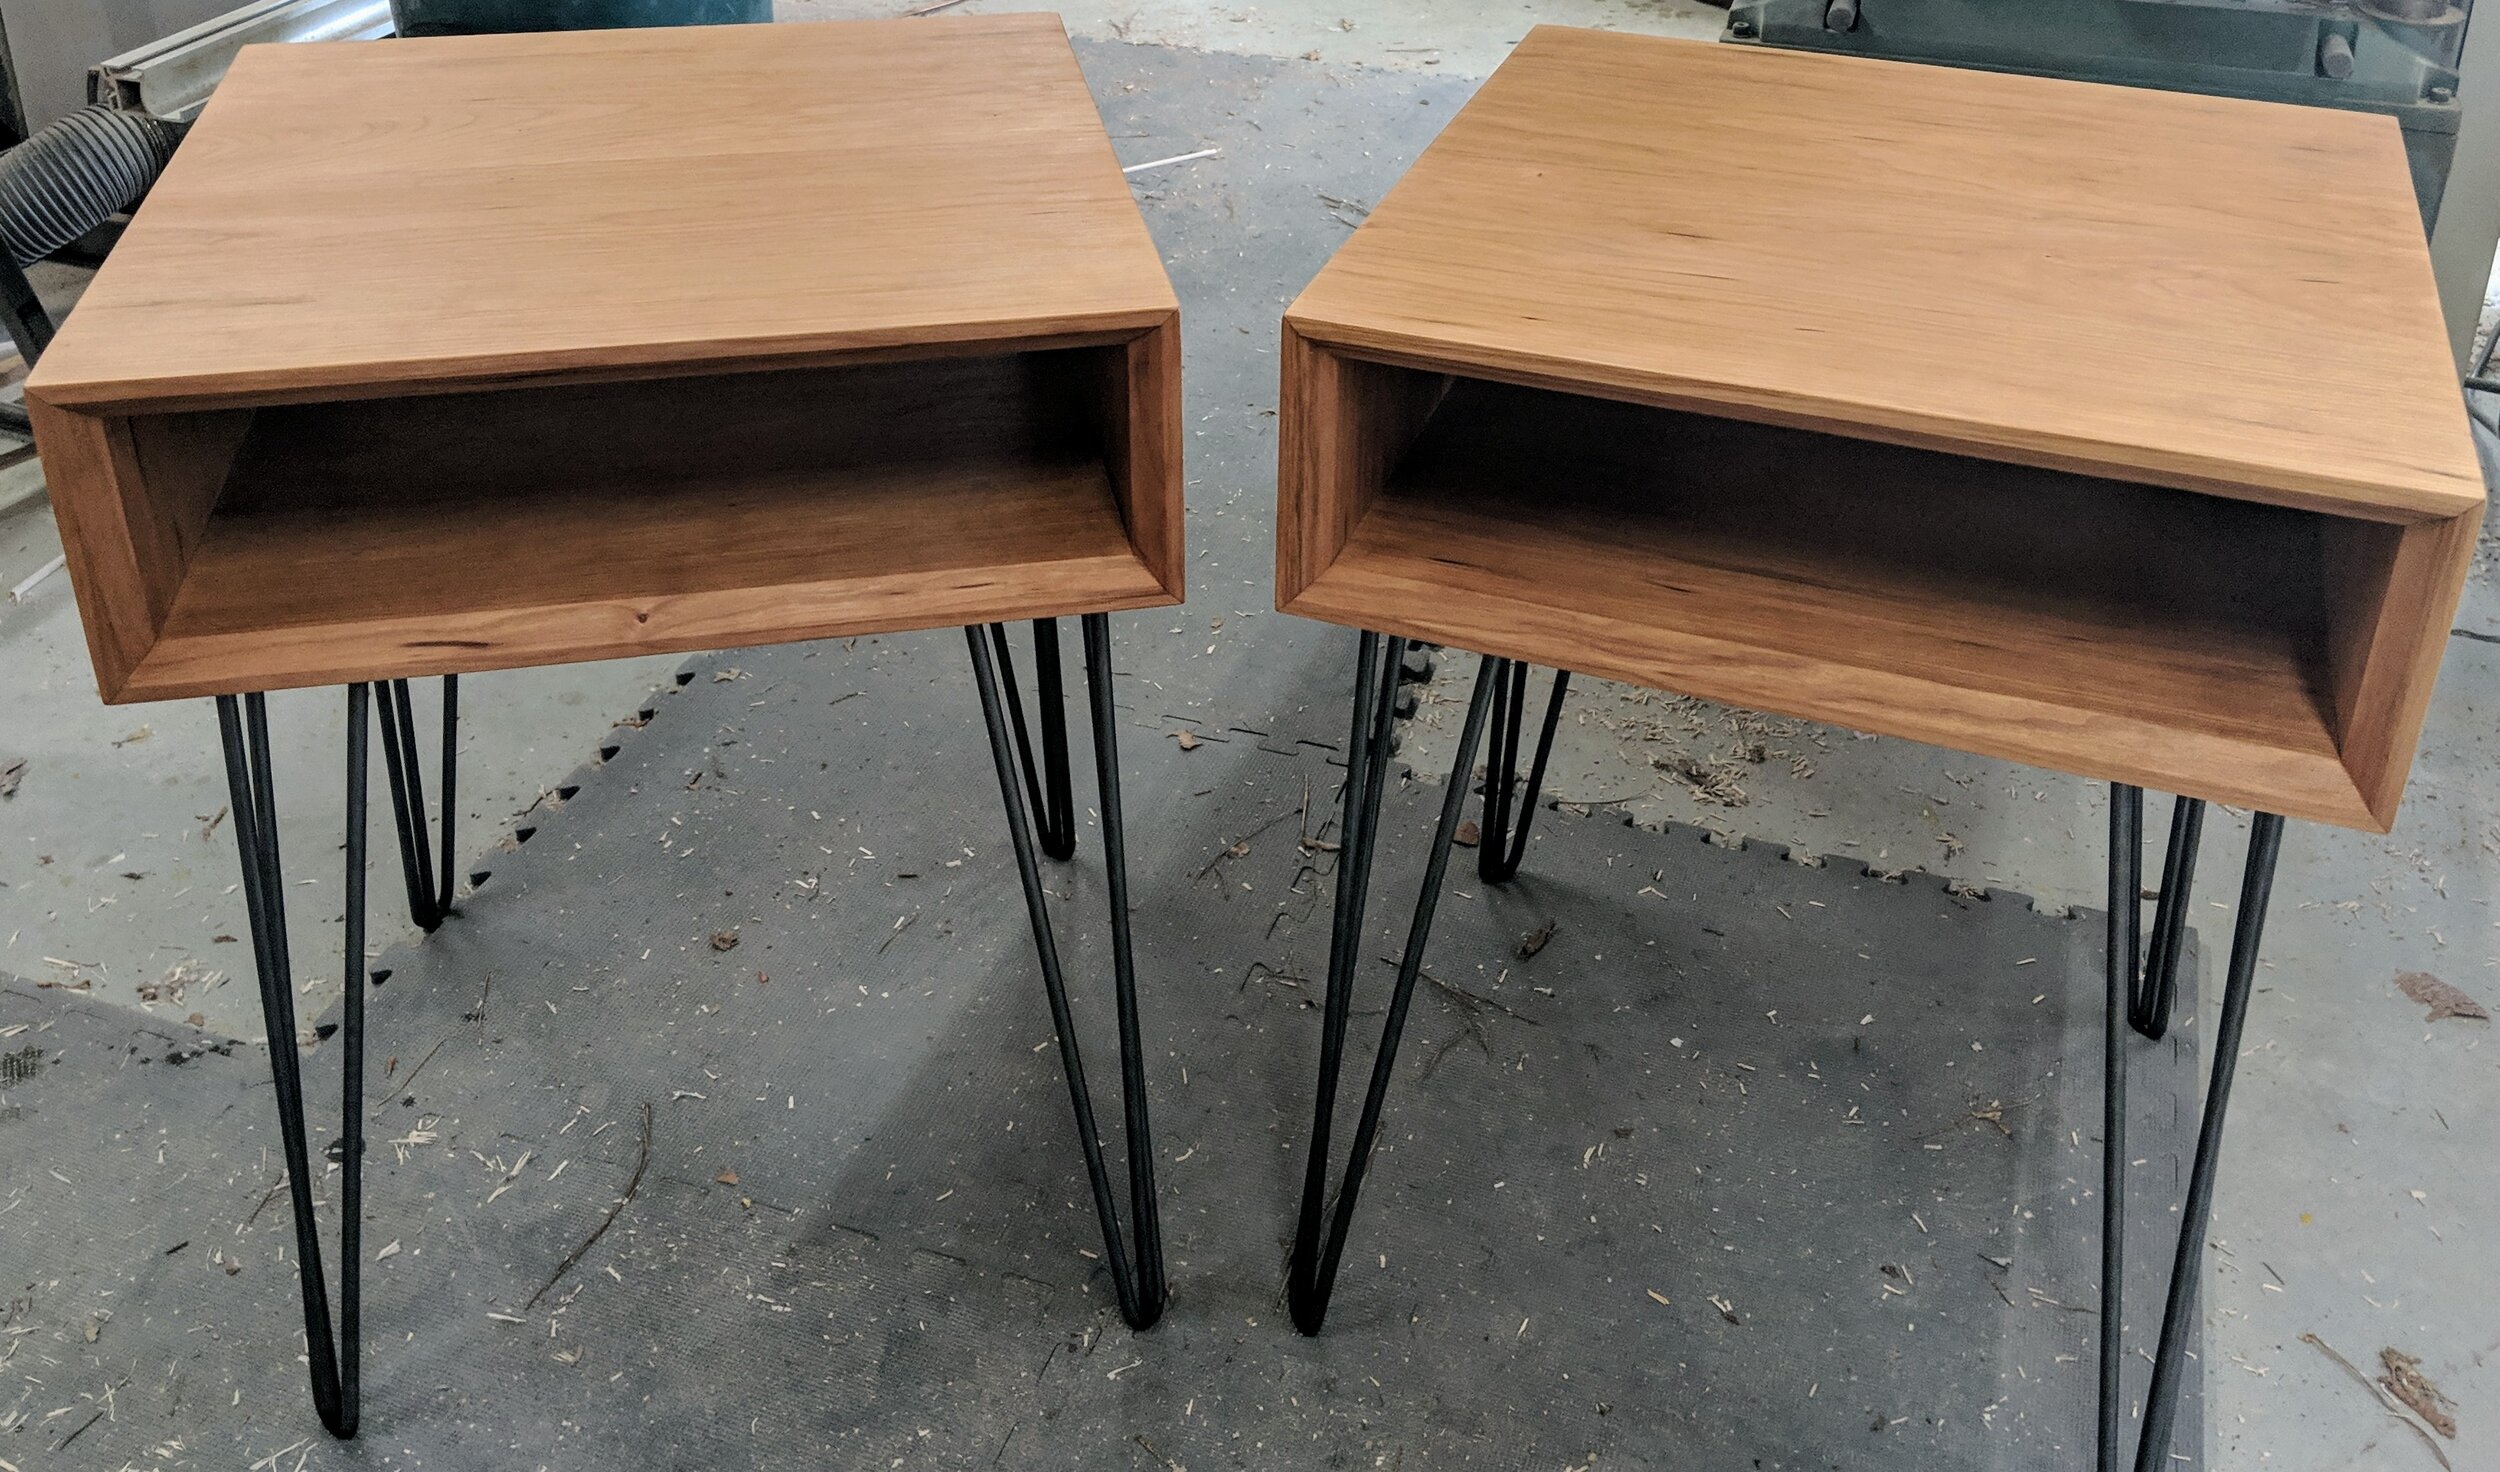 Matching Mid Century Modern Bedside Tables Vanvleet Woodworking